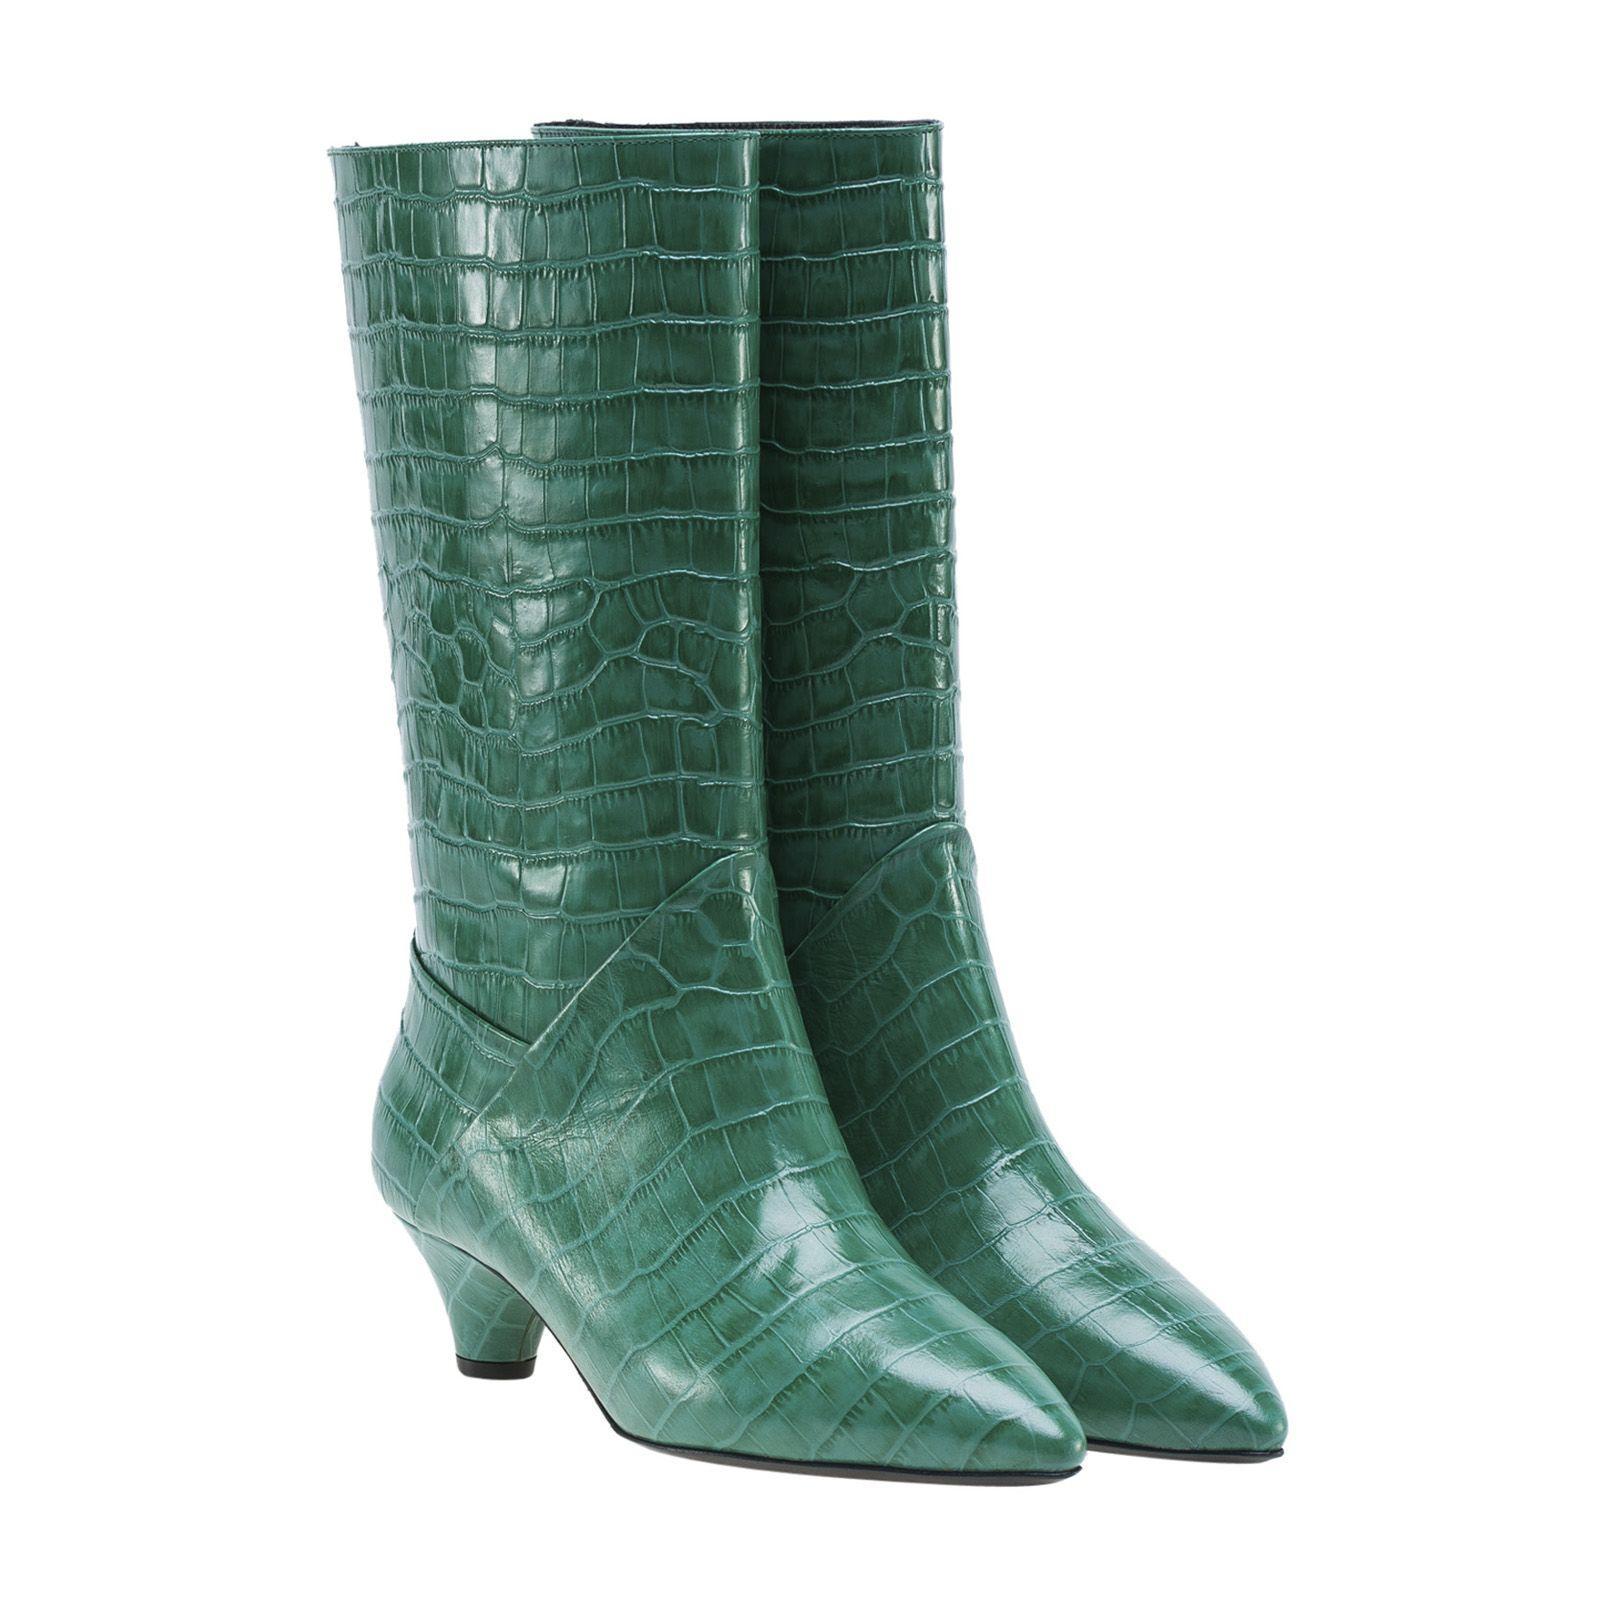 Marni Kitten Heel Boots In Green